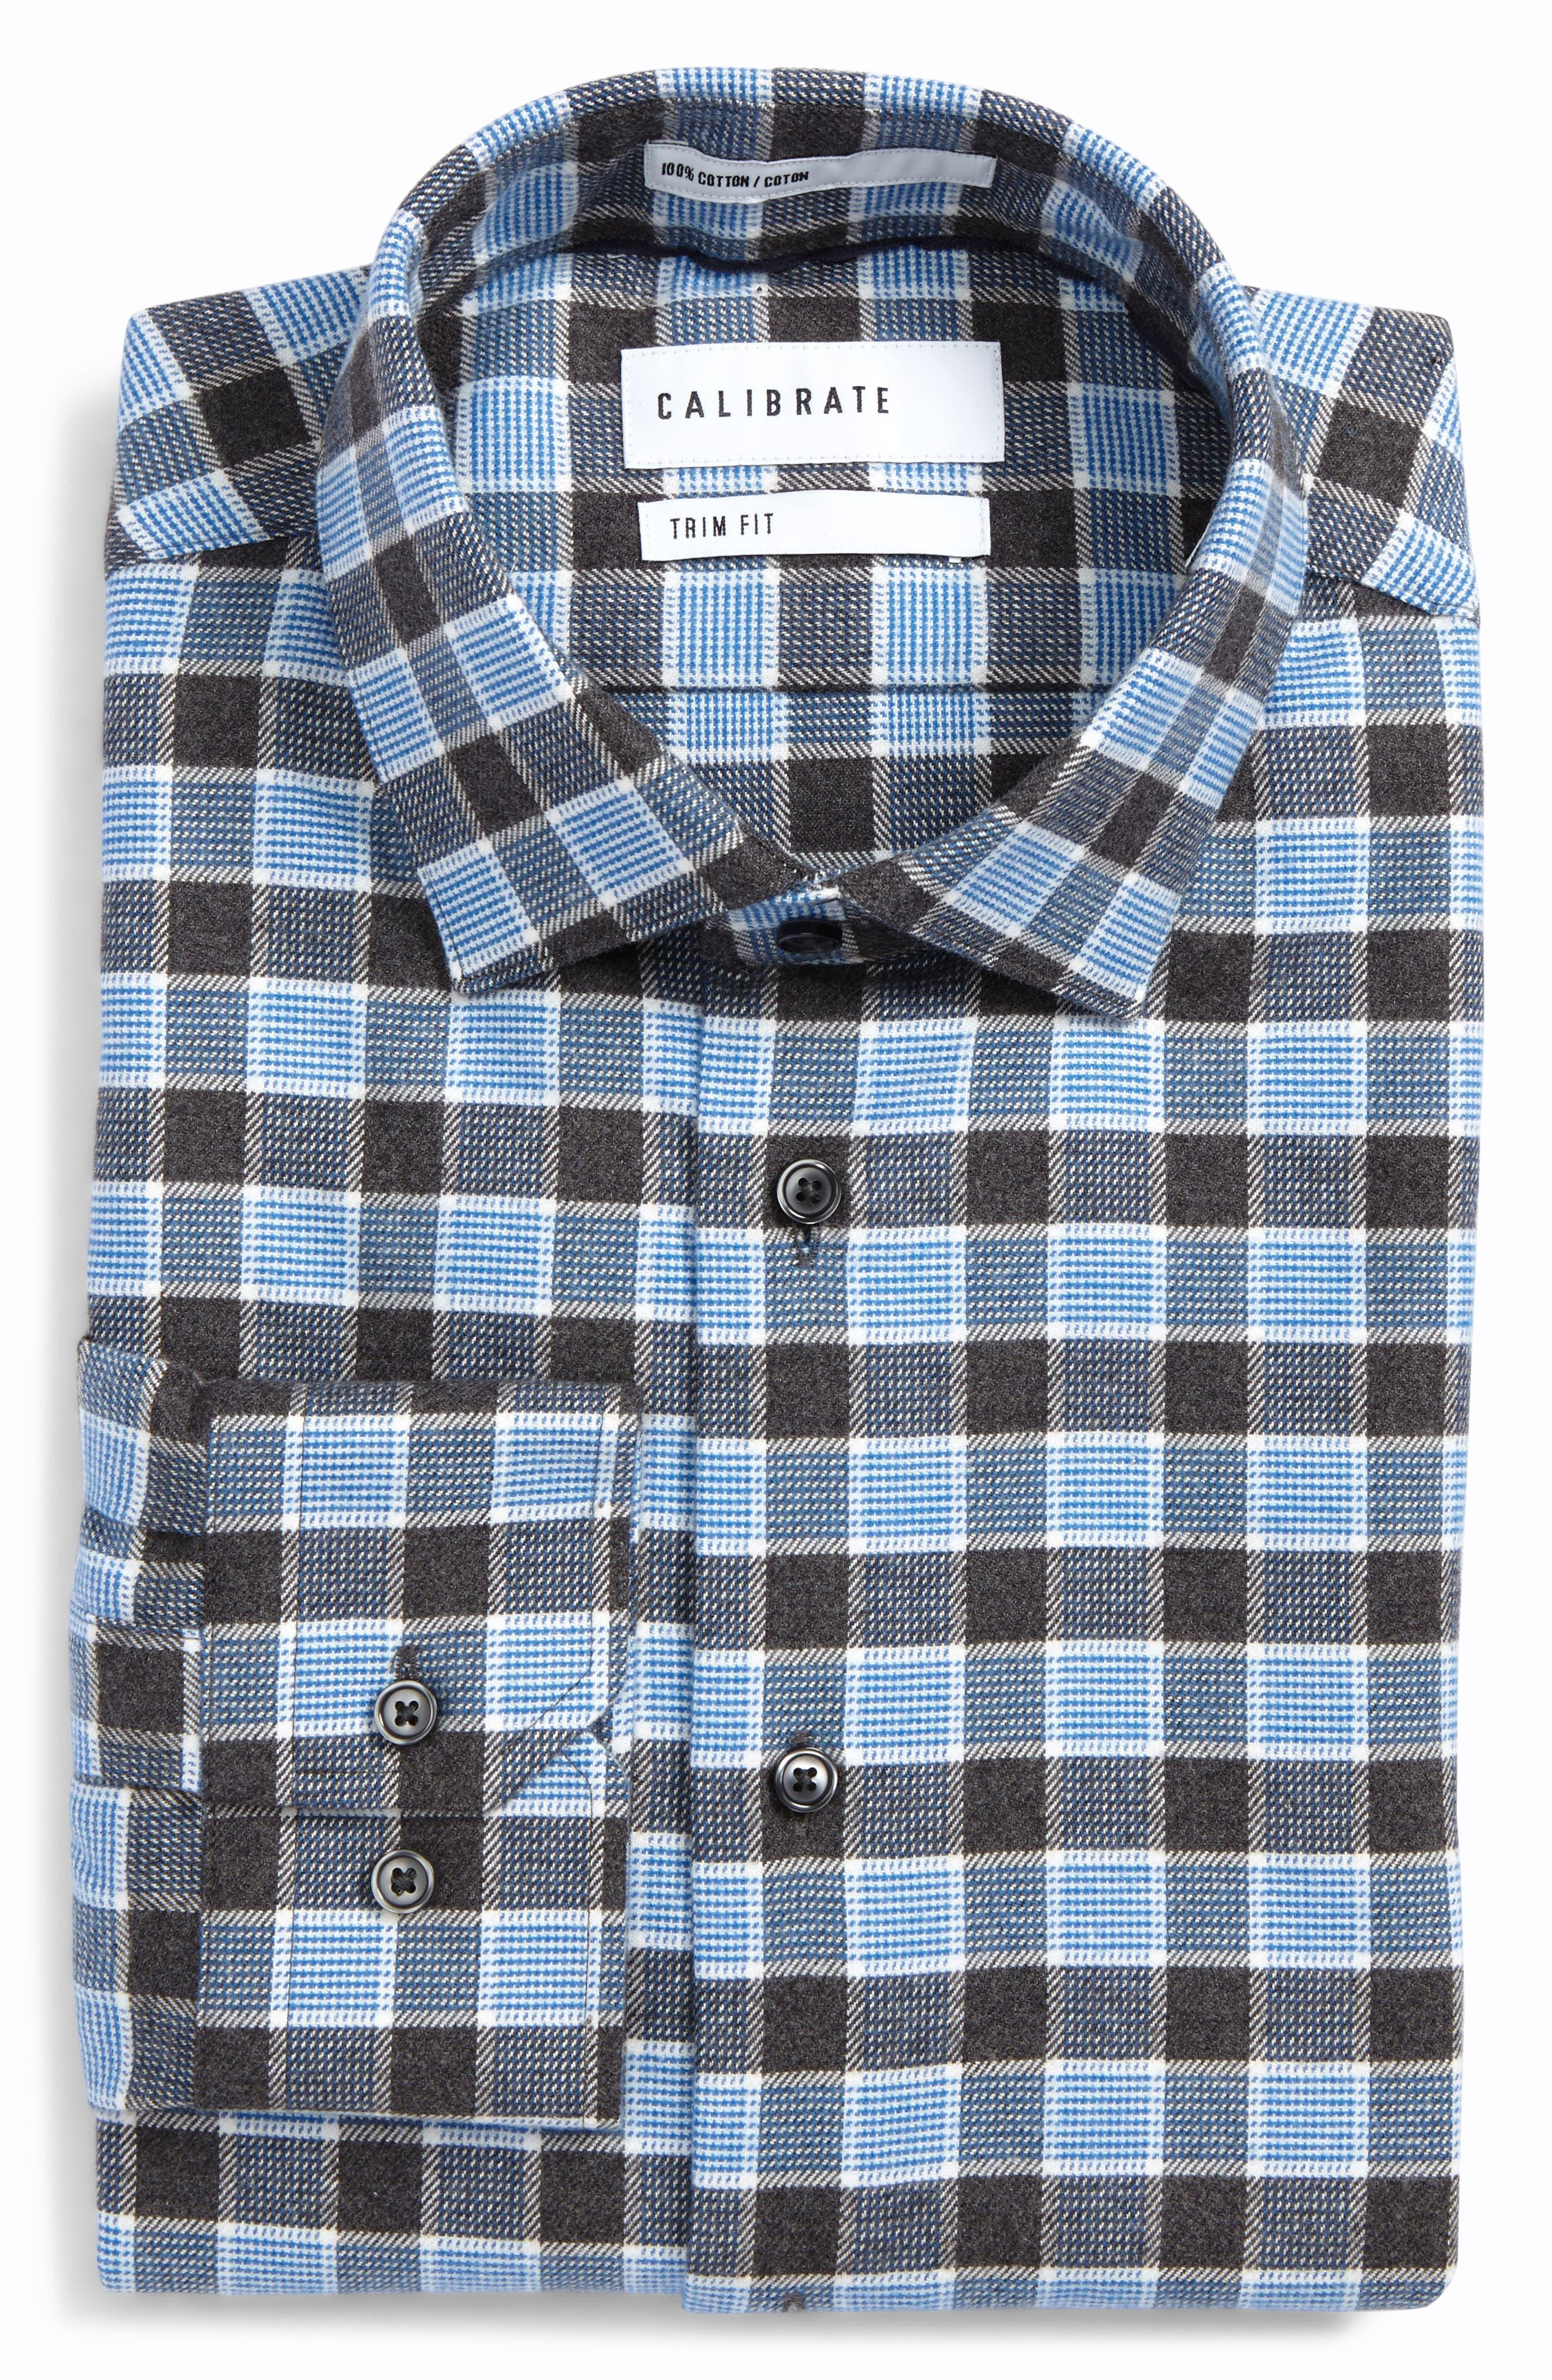 Main Image - Calibrate Trim Fit Non-Iron Plaid Dress Shirt